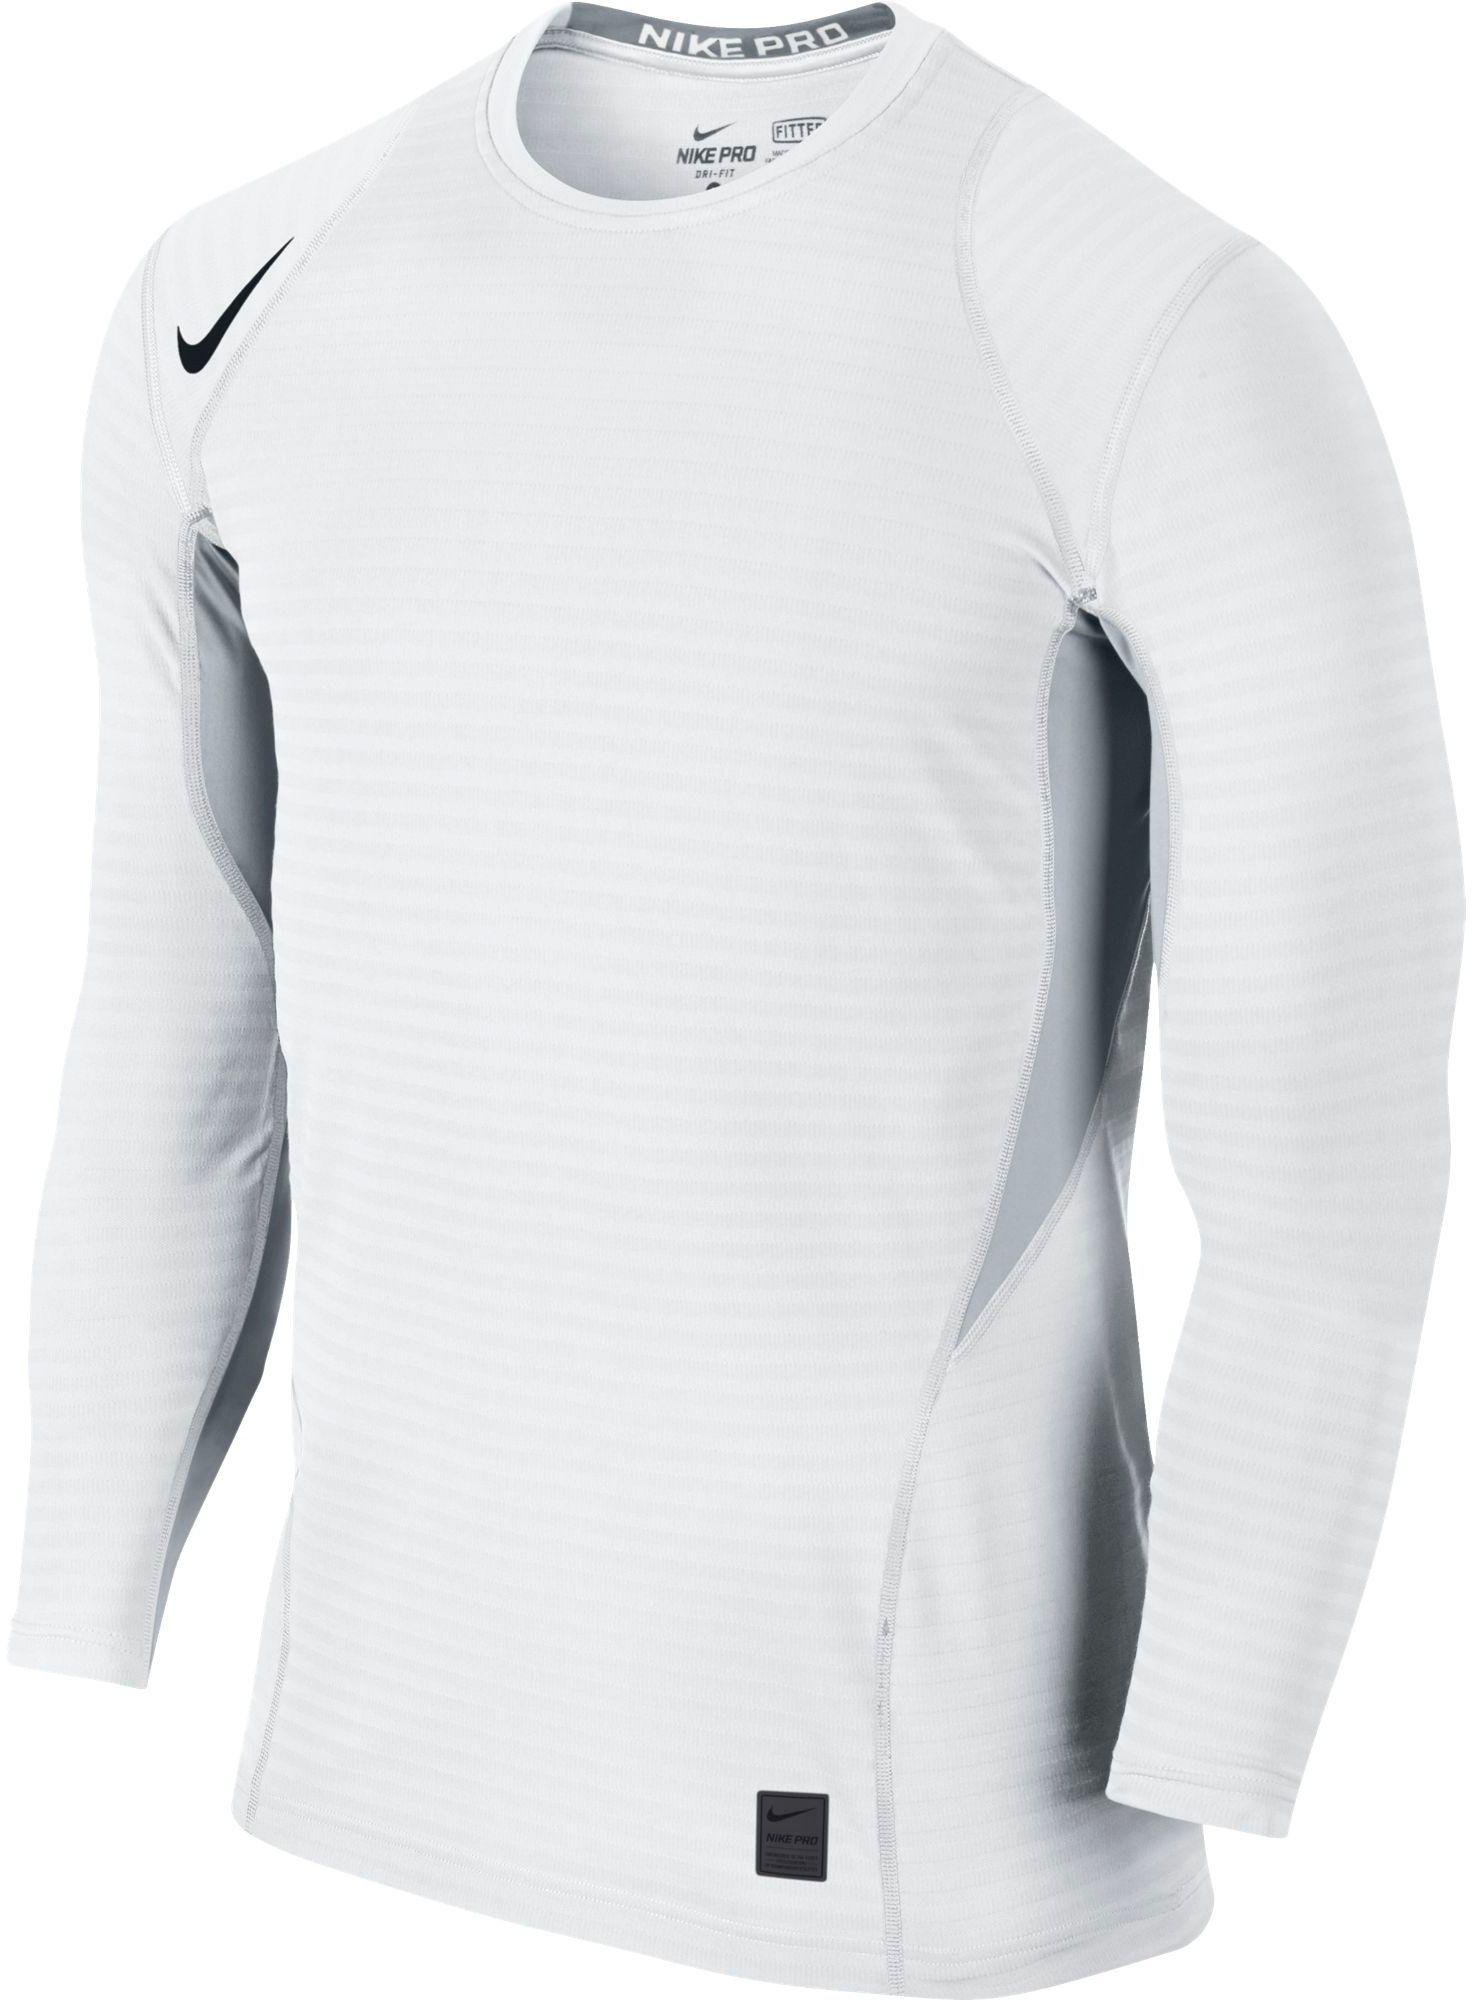 24f674f8691 Long Sleeve Nike Compression Shirt - BCD Tofu House